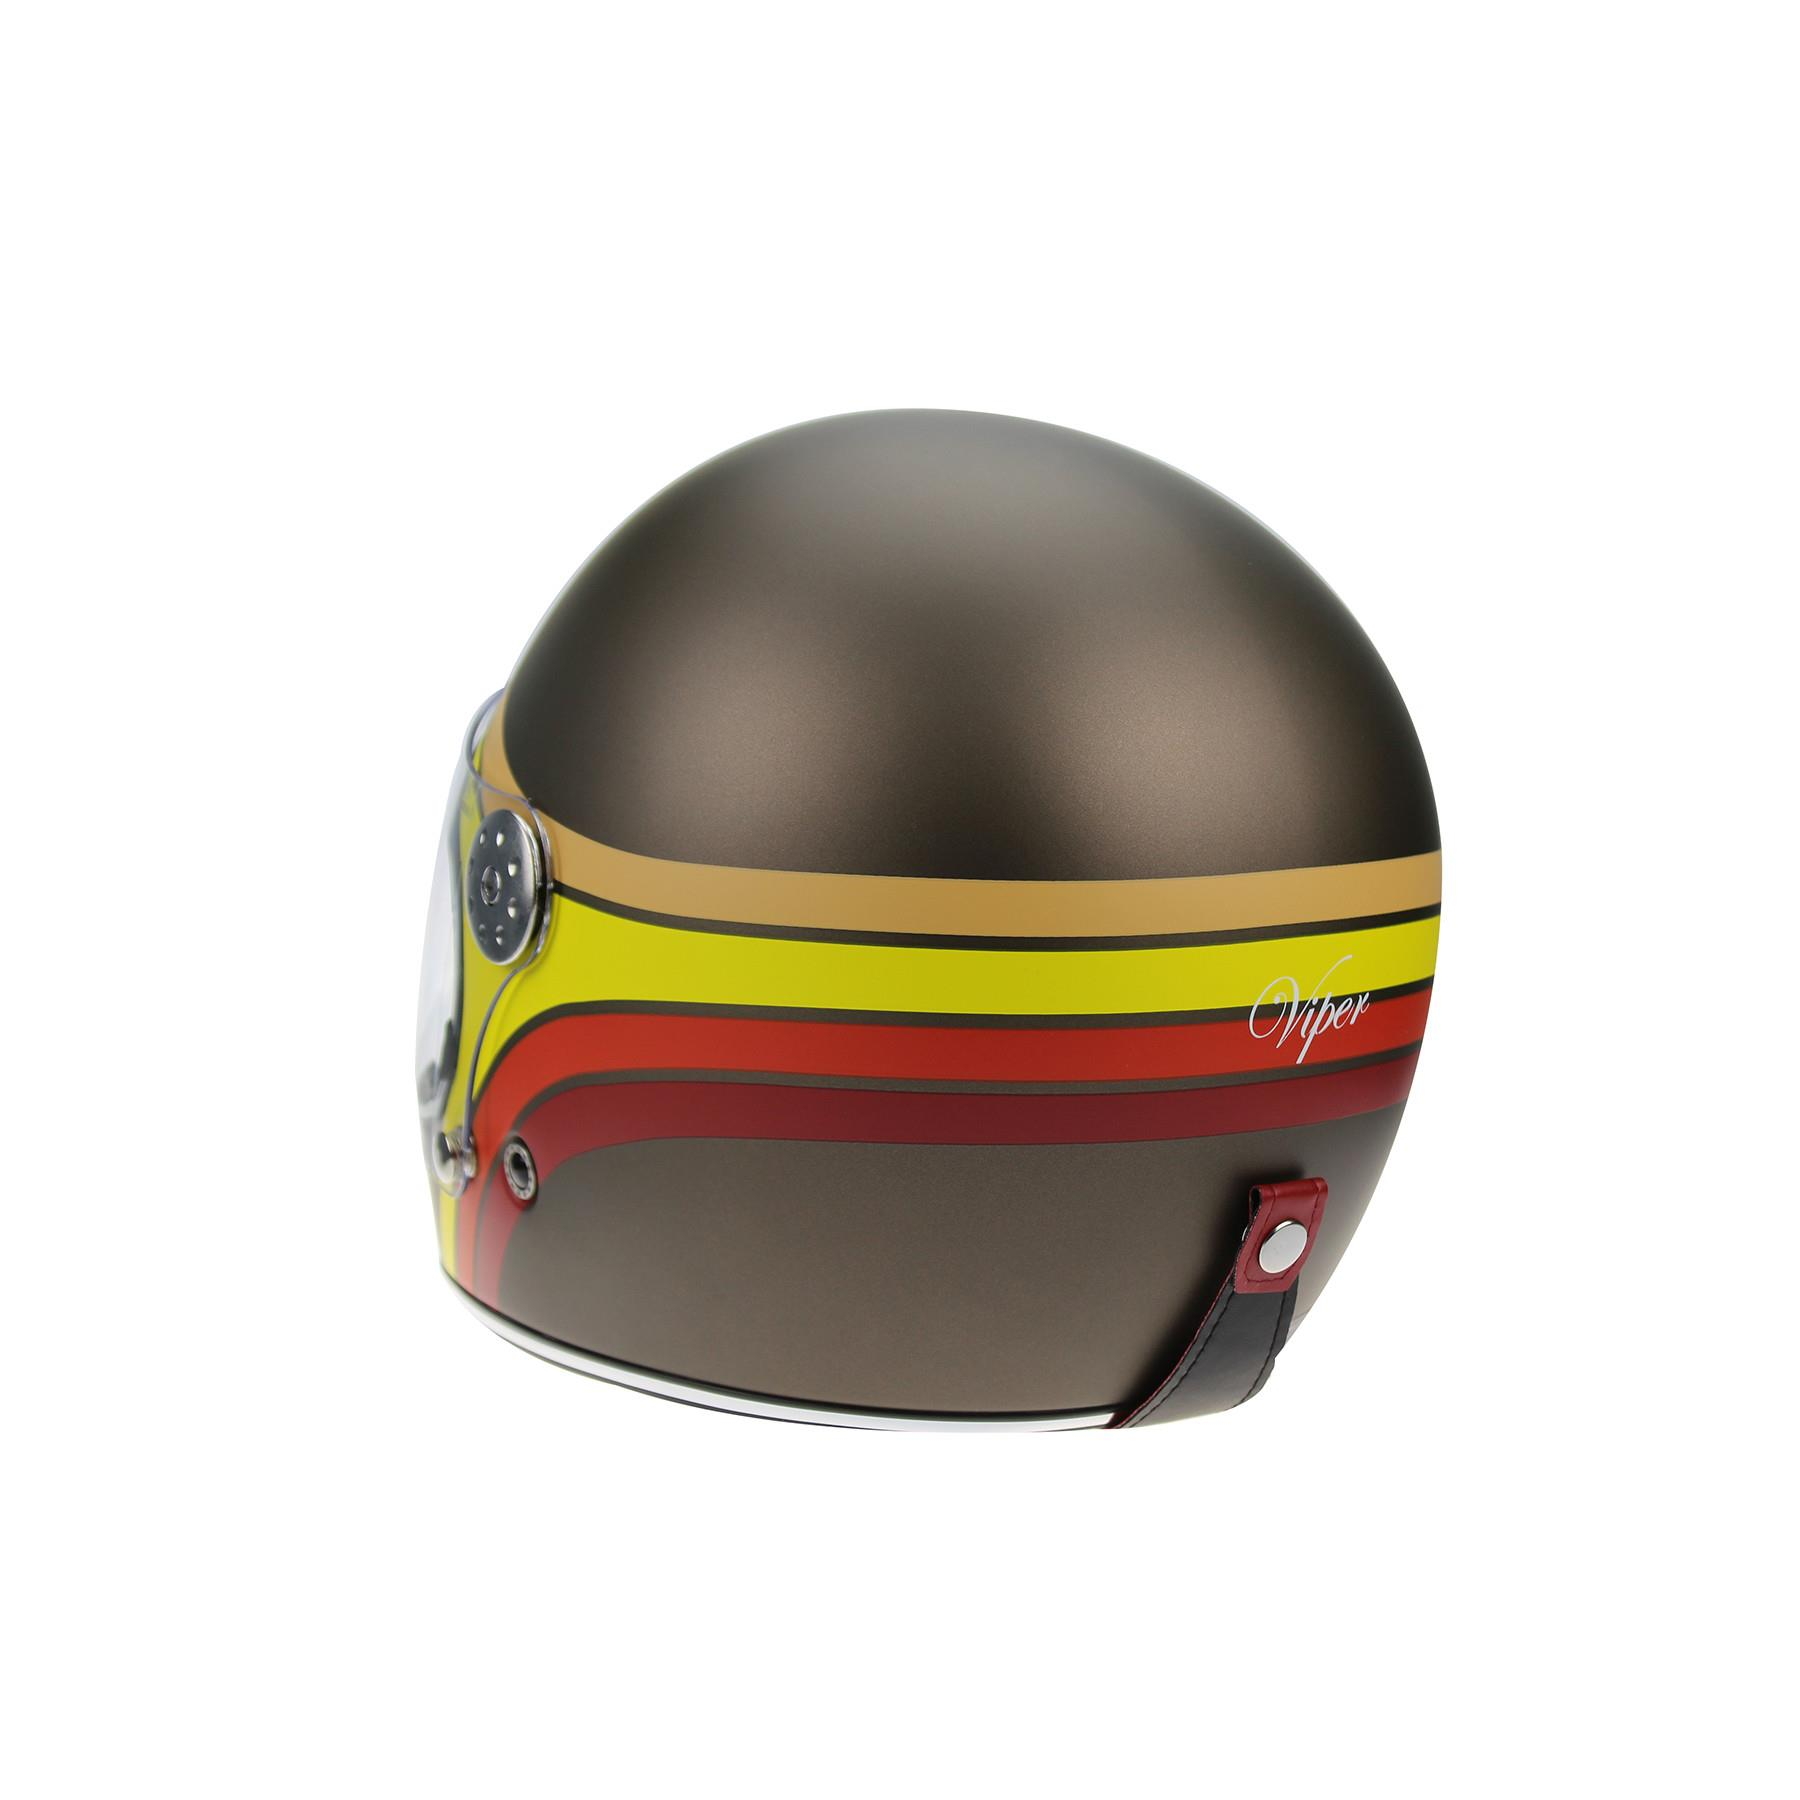 Viper-F656-Retro-Vintage-FibreGlass-Full-Face-Motorcycle-Bike-Road-Crash-Helmet miniature 31